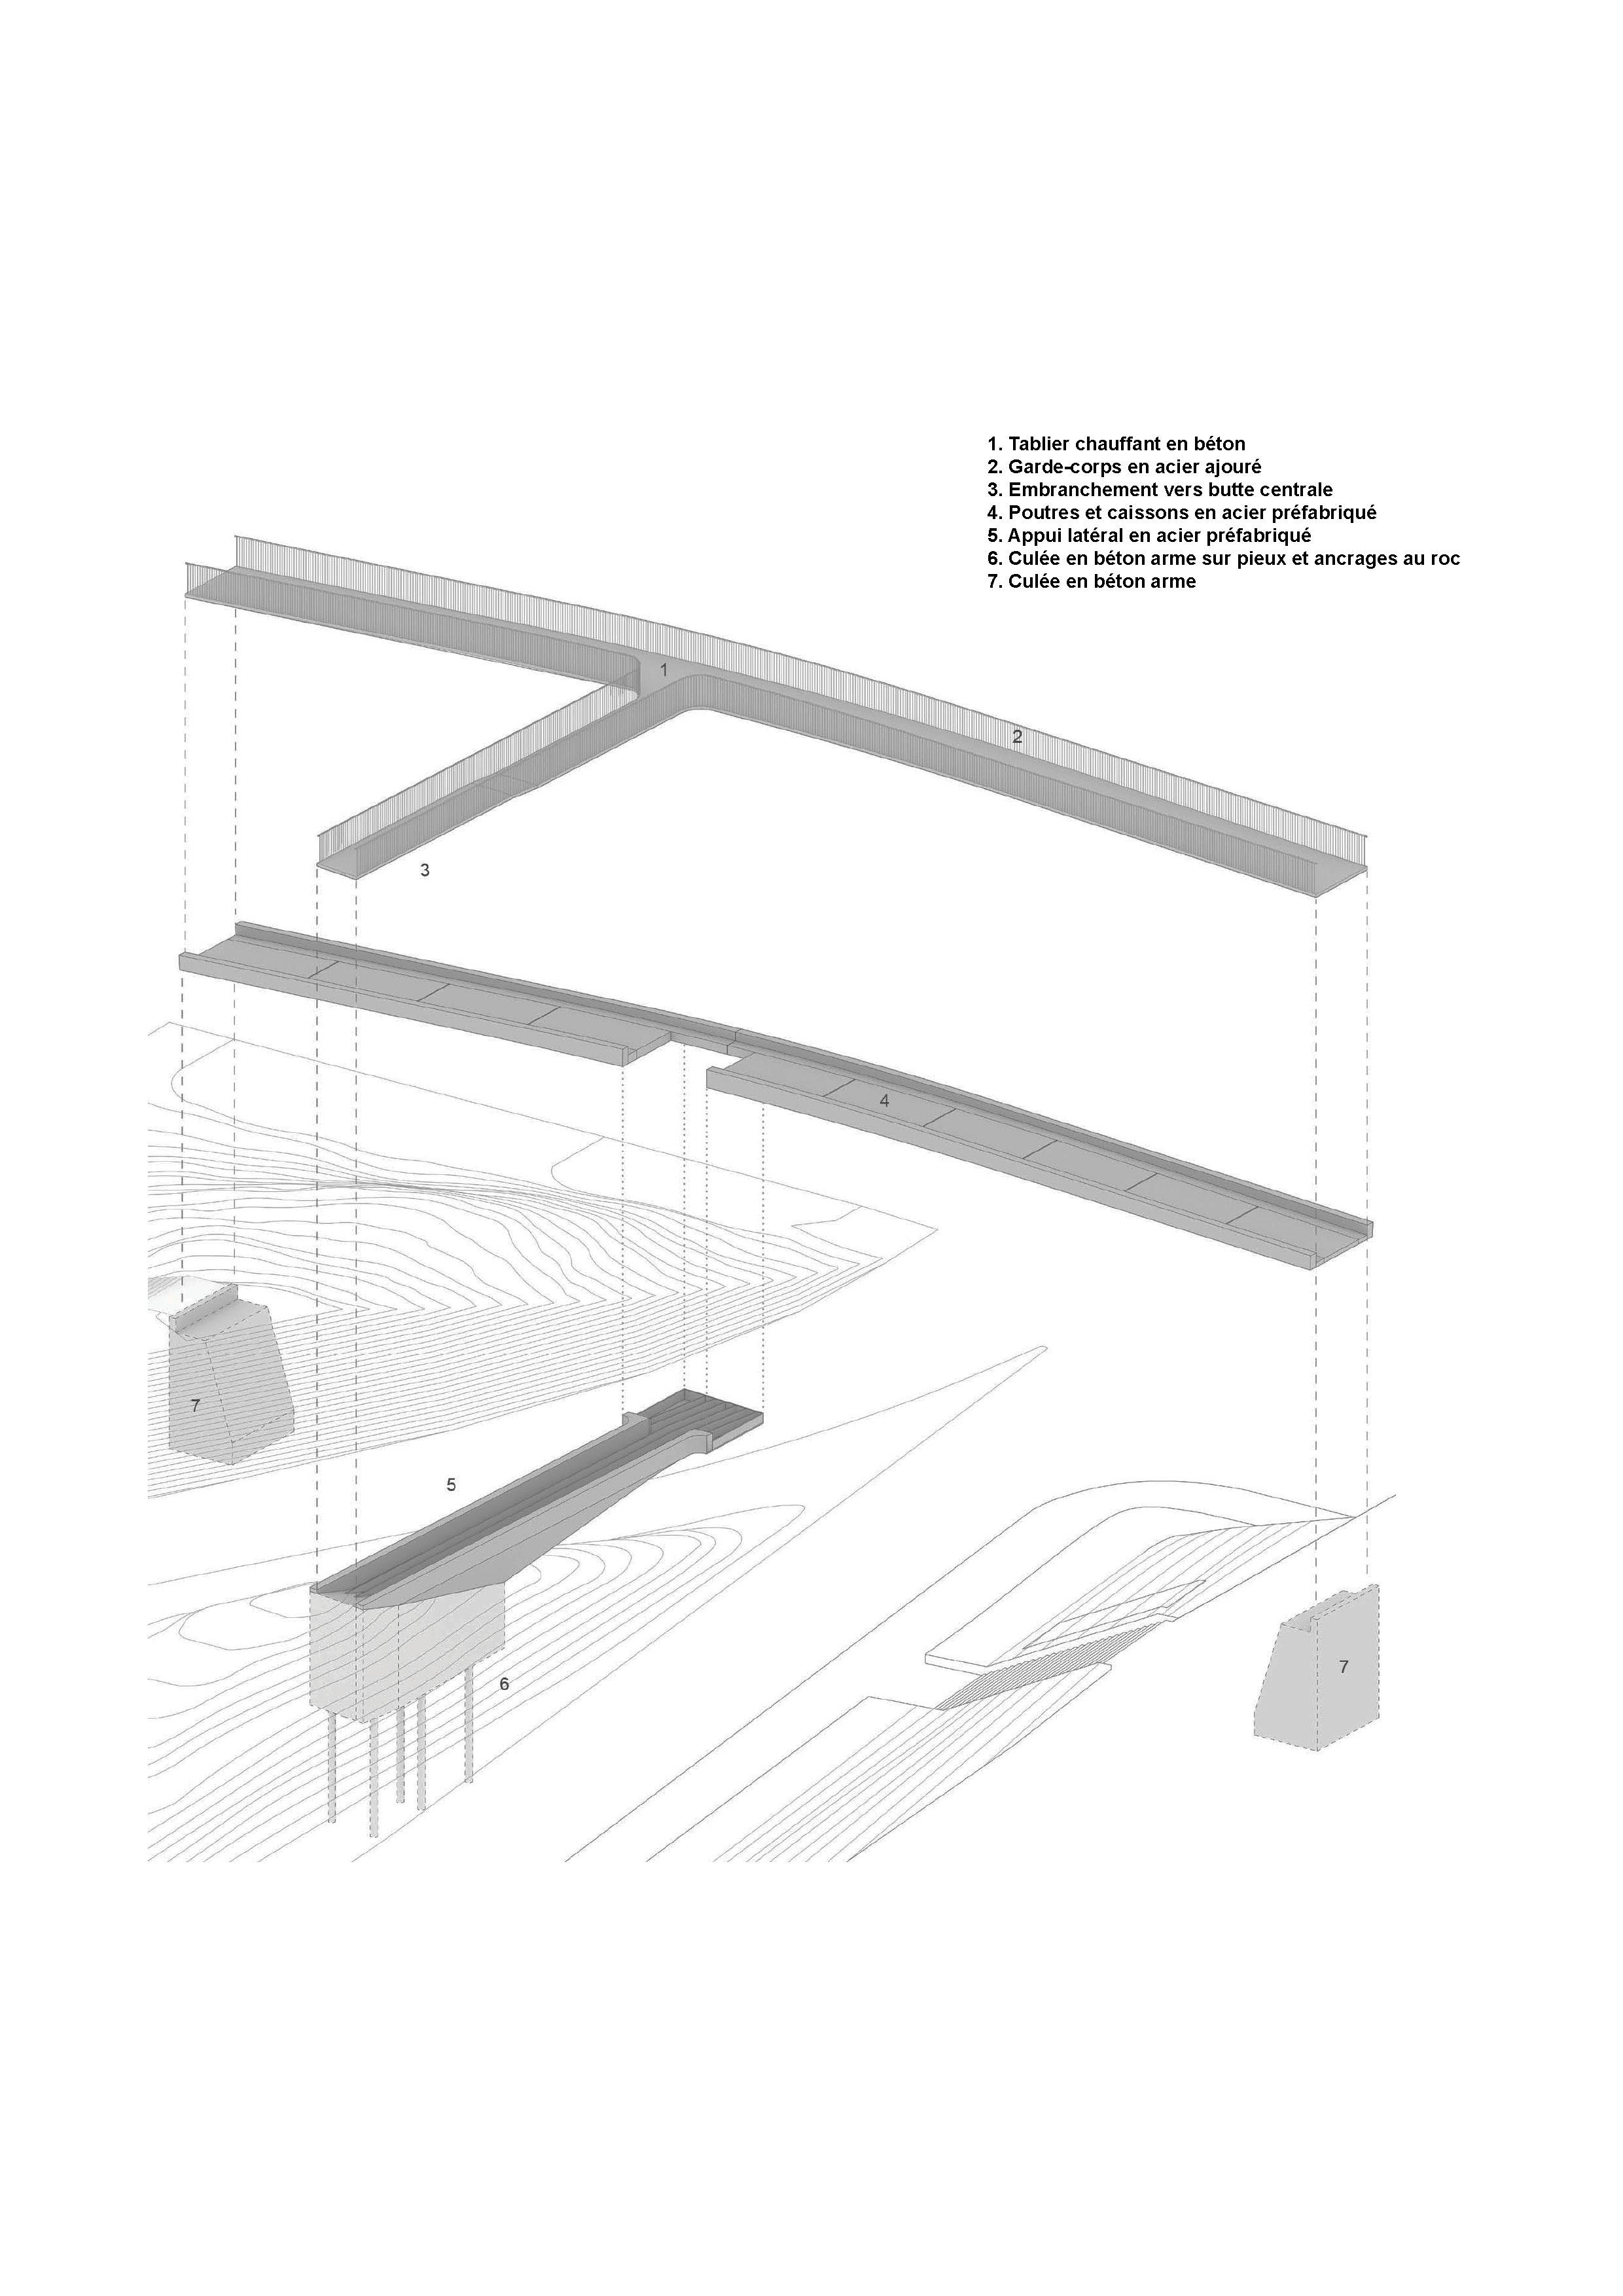 Pelletier-de-Fontenay-Bureau-Bas-Smets_PDM_04_axo_web.jpg